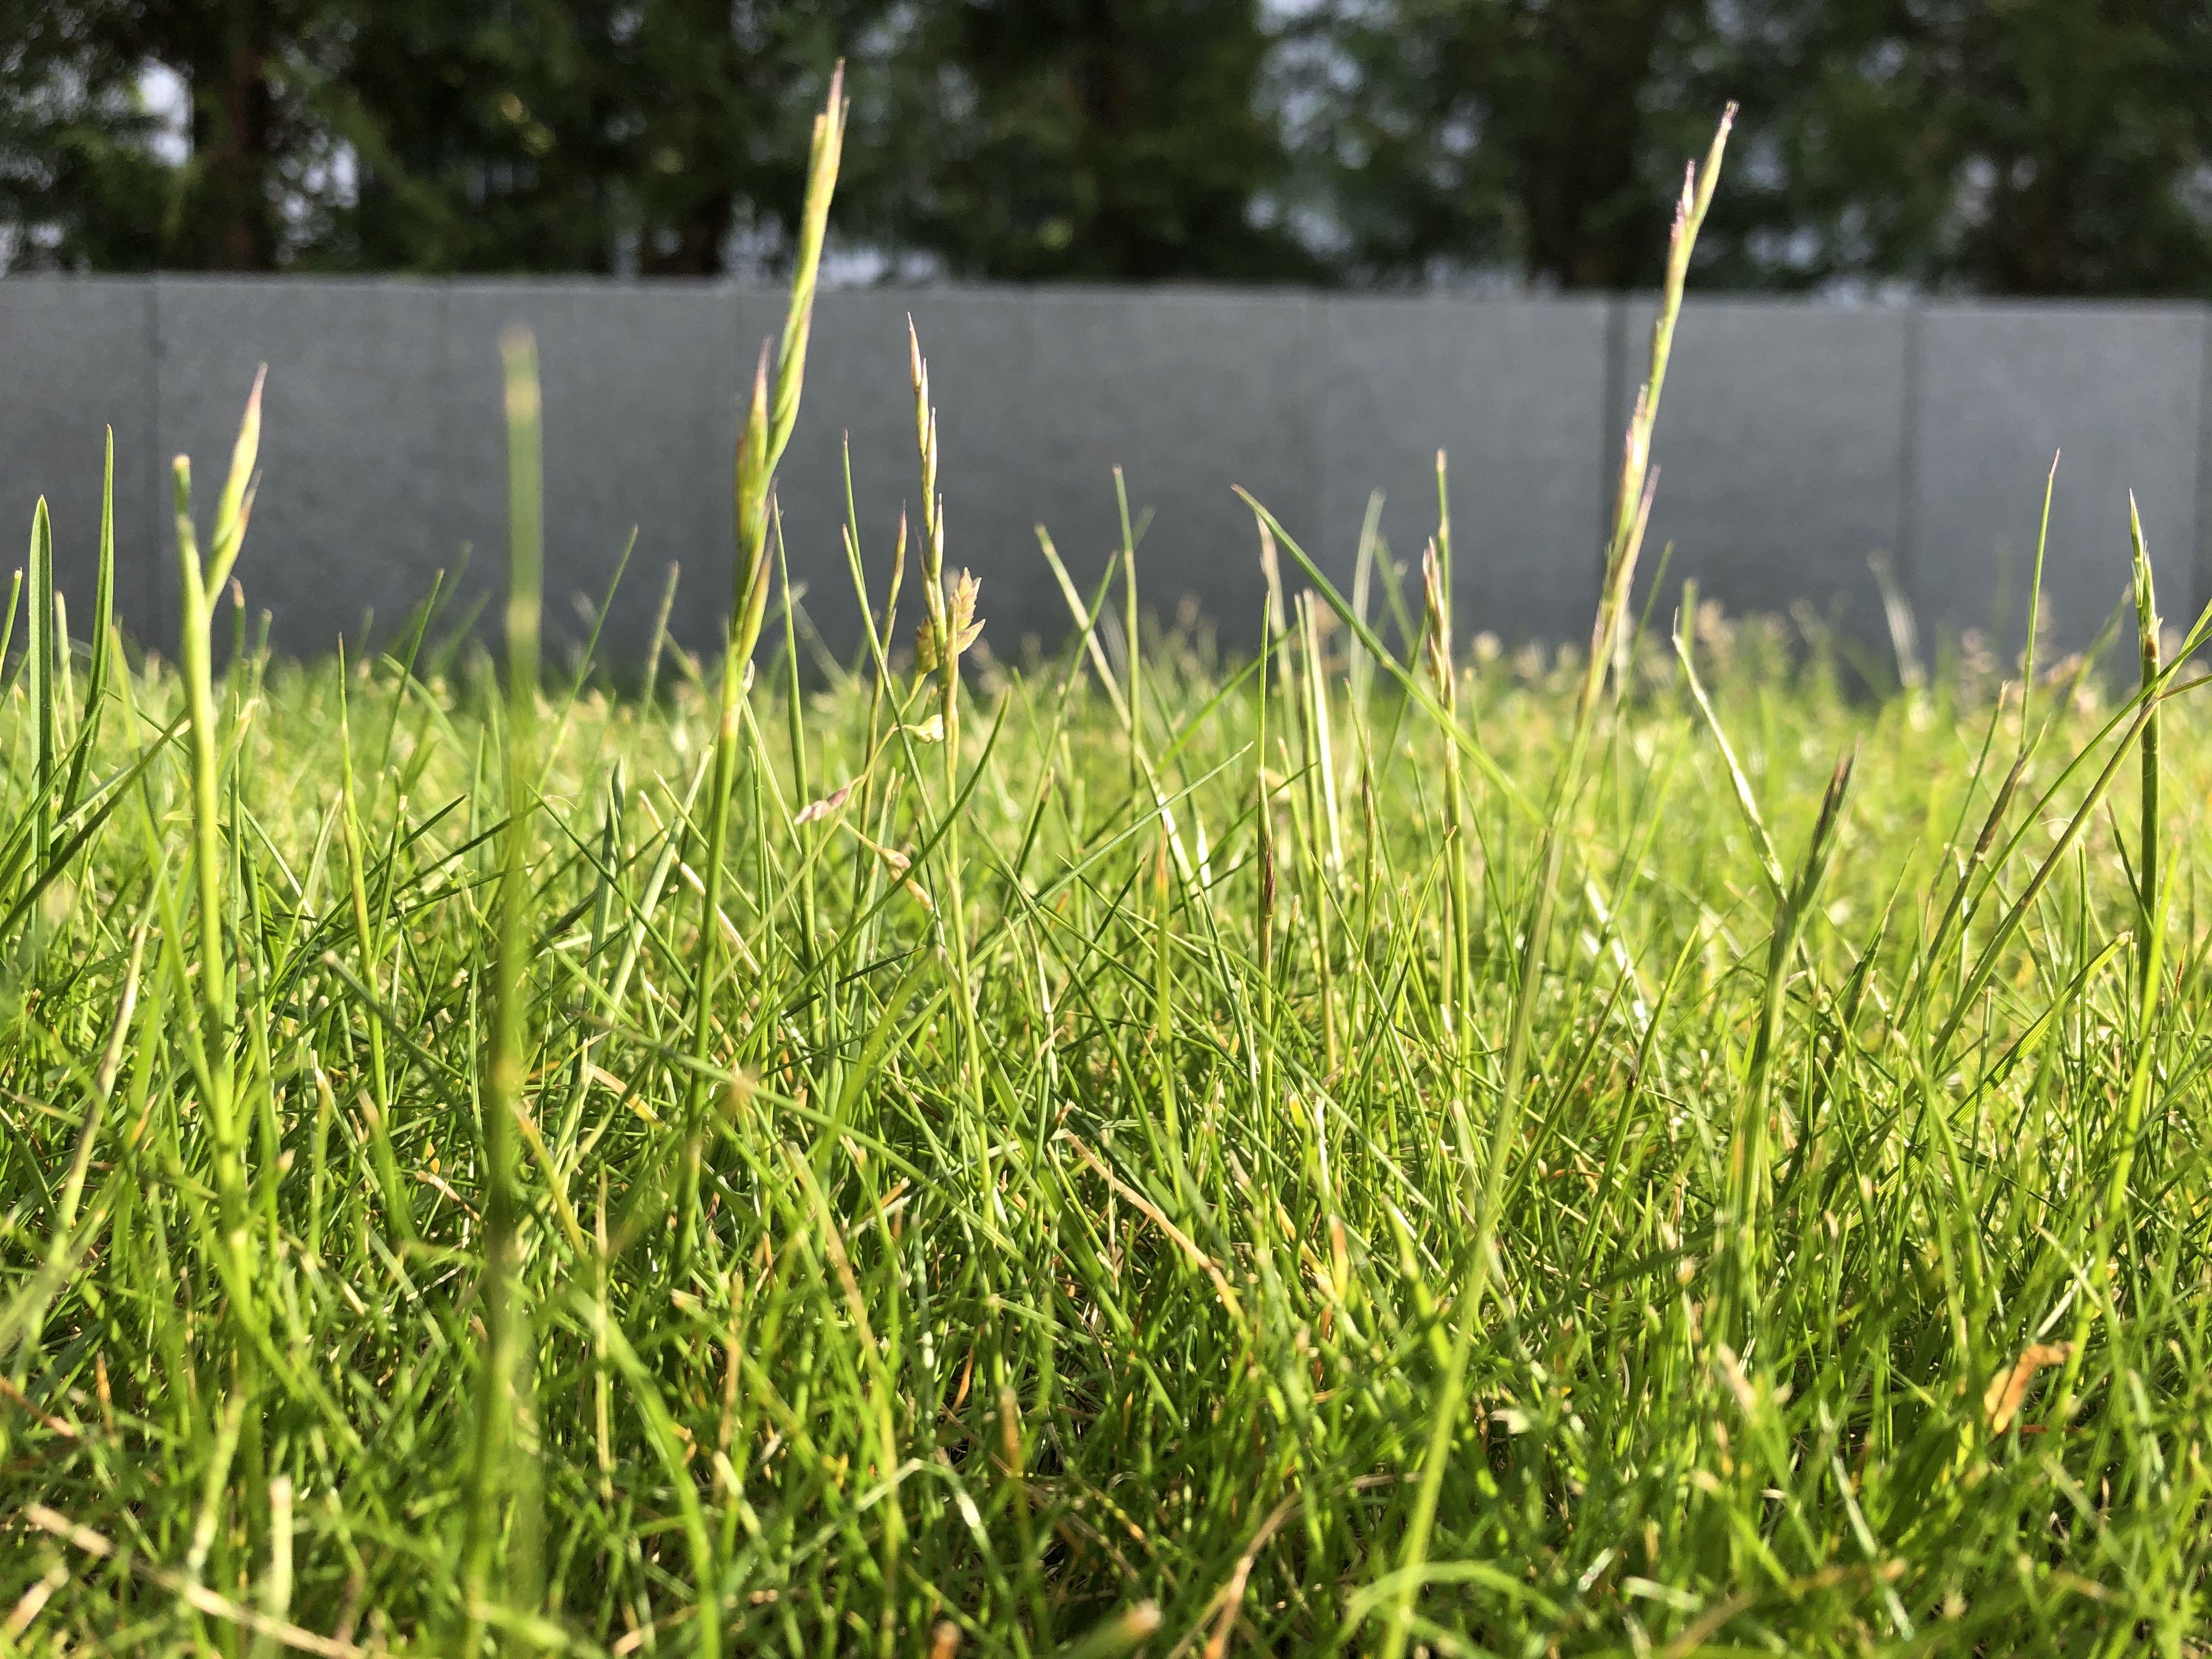 Rasenpflege Alles Zum Thema Mahen Dungen Saen Und Vertikutieren Vertikutieren Rasenpflege Rasenvertikutierer